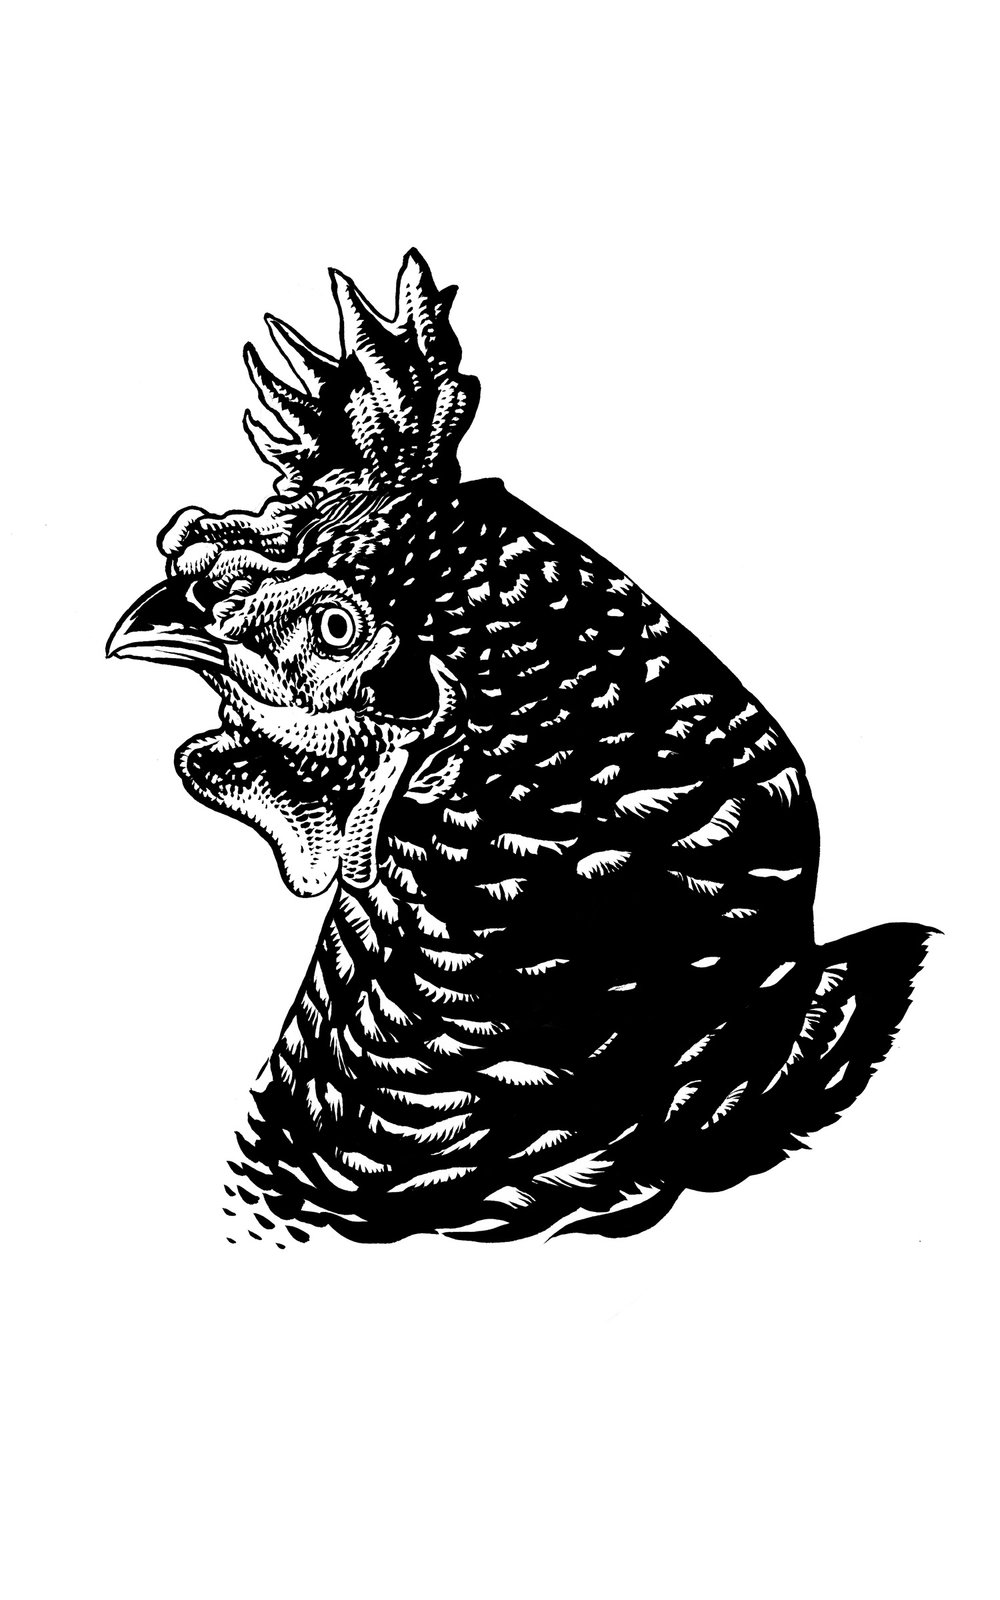 Chicken 824 1.jpg